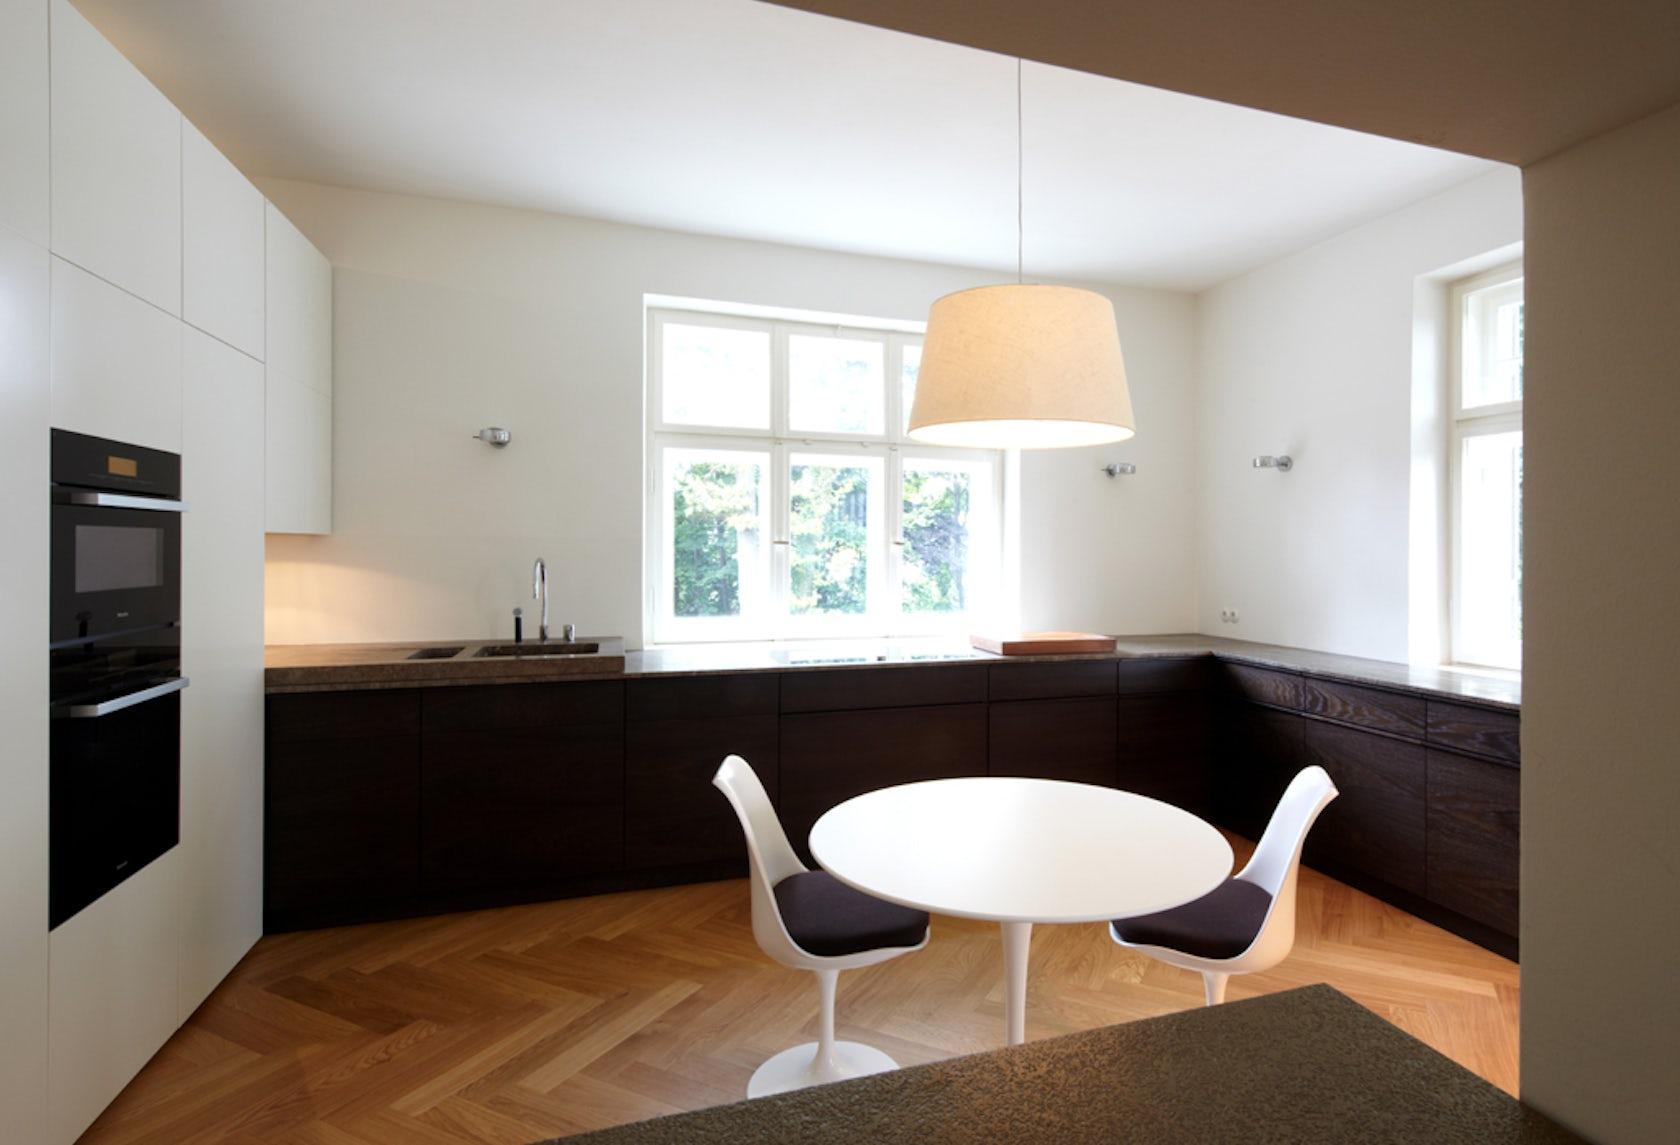 holzrausch architizer. Black Bedroom Furniture Sets. Home Design Ideas